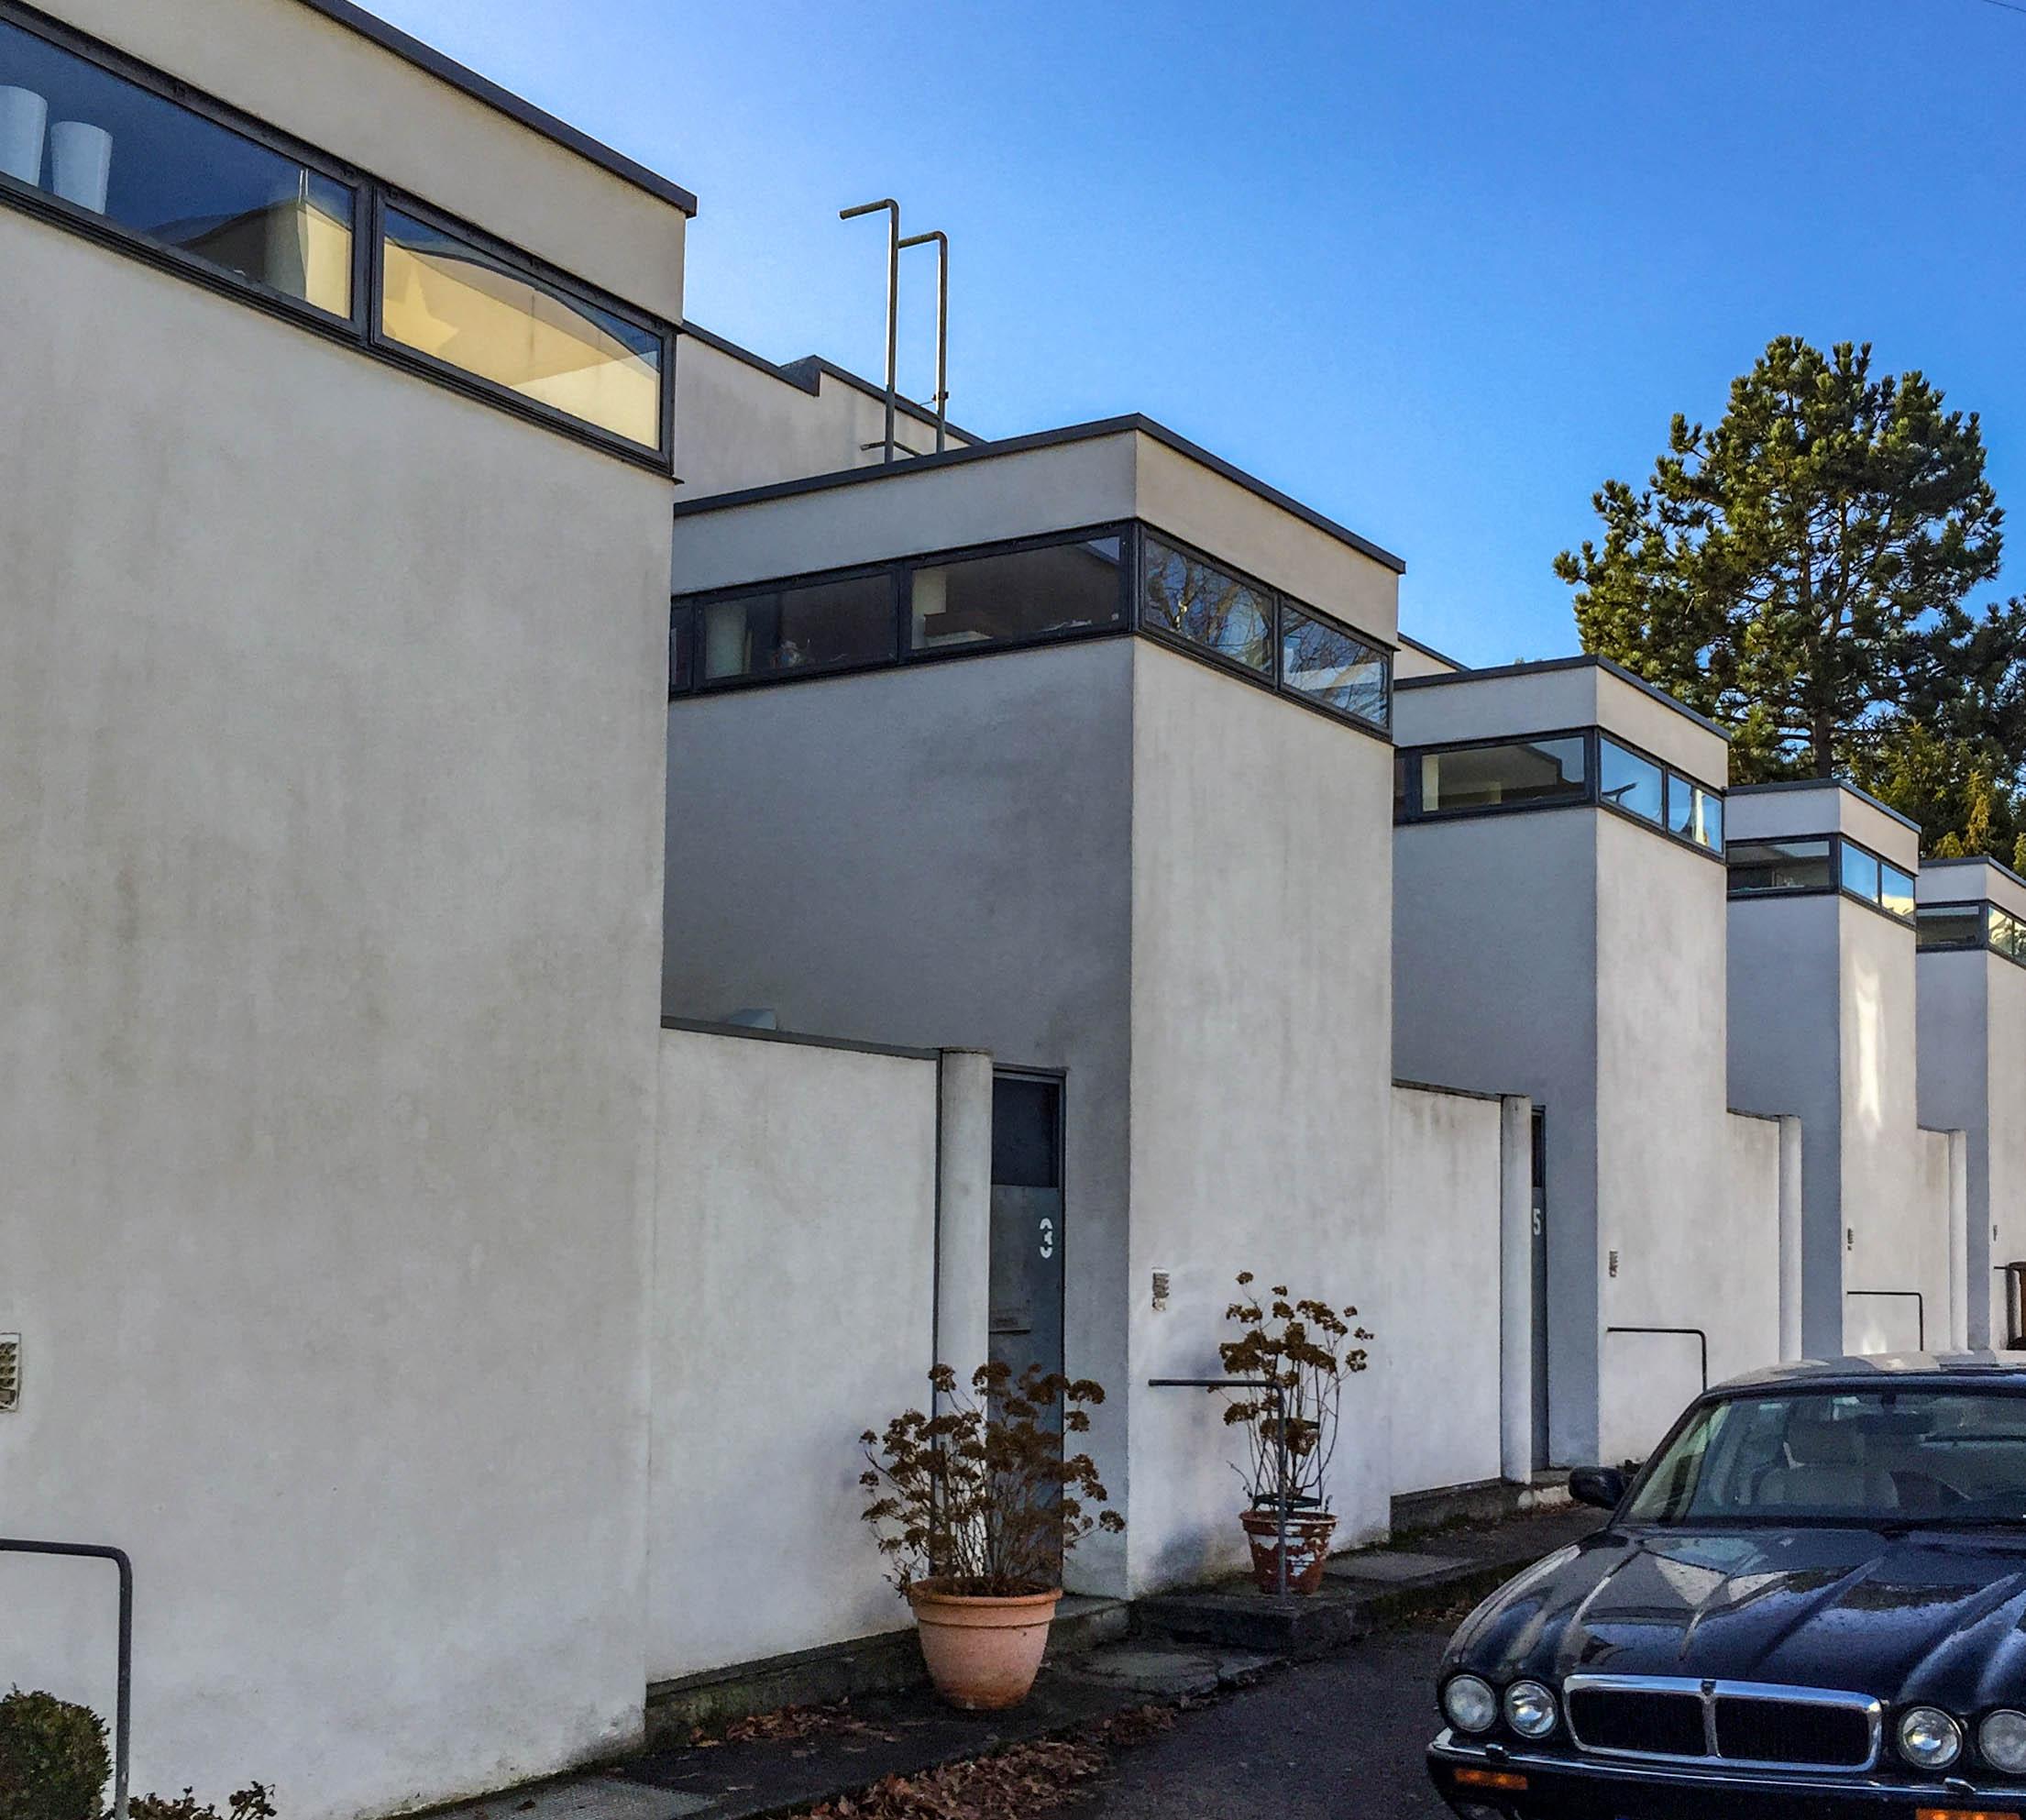 Reihenhäuser, 1927. Architekt: J.J.P.Oud